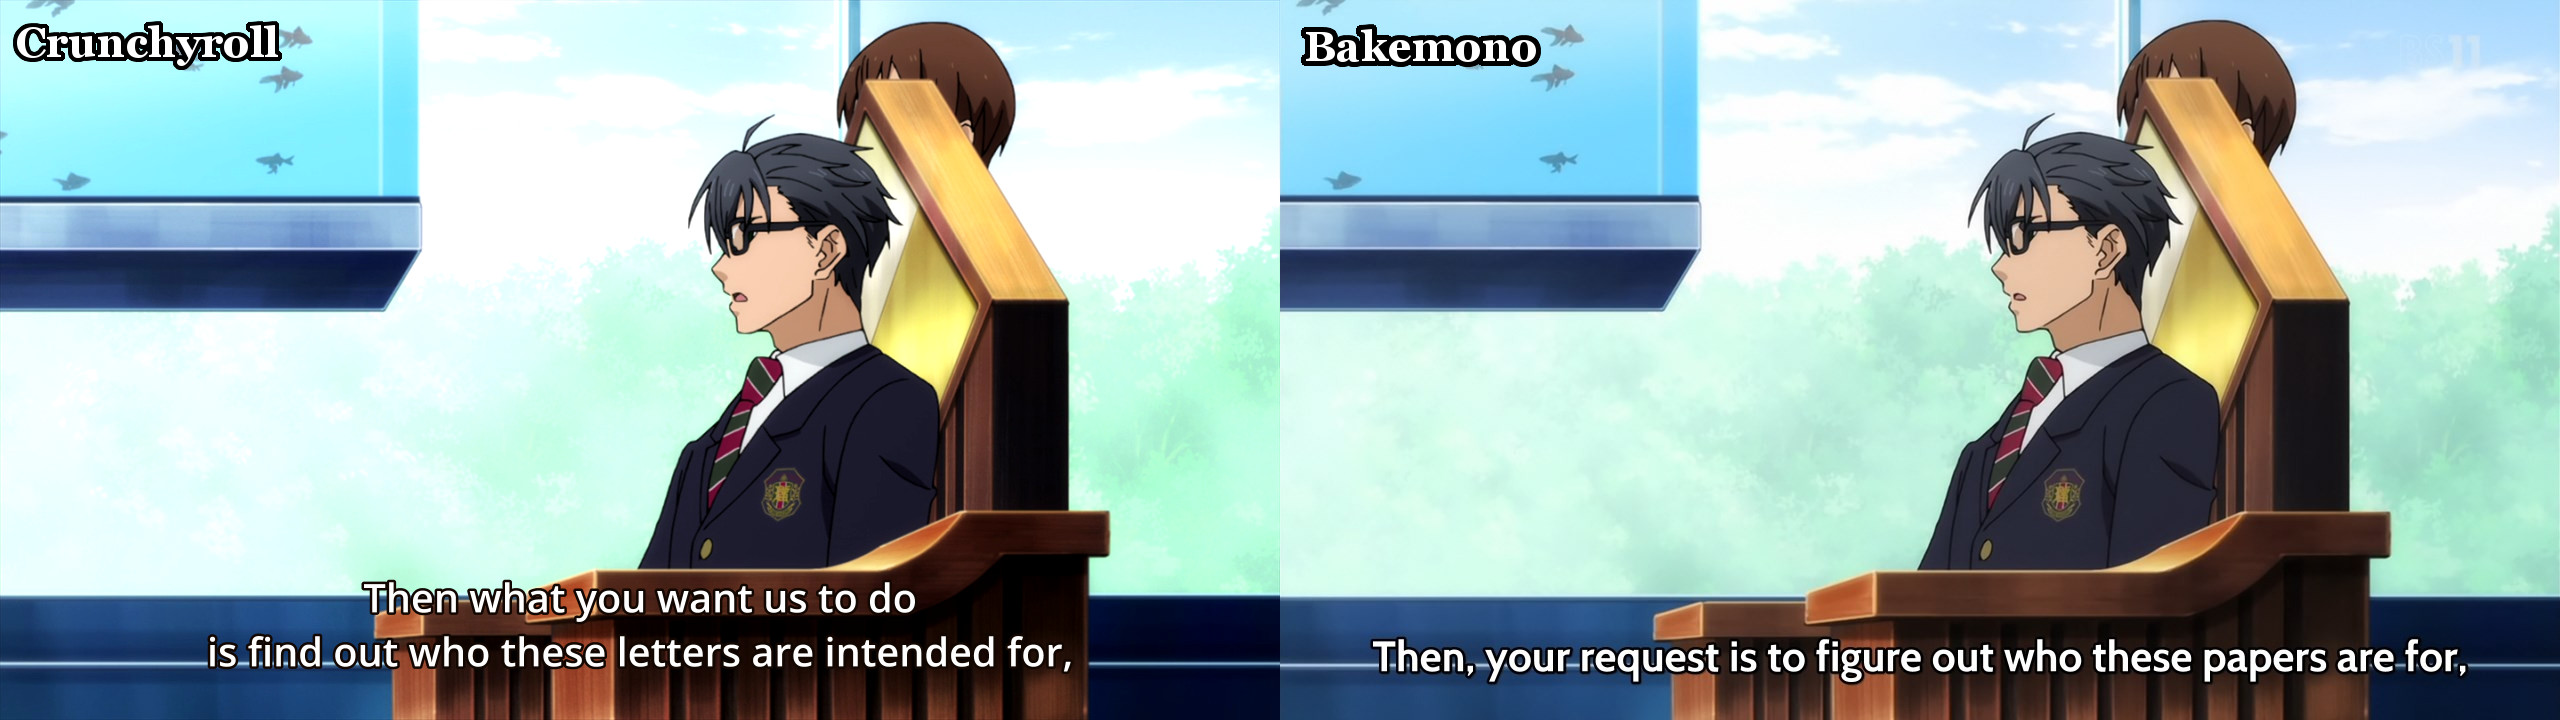 crunchyroll_versus_bakemono_-_trickster_-_9q